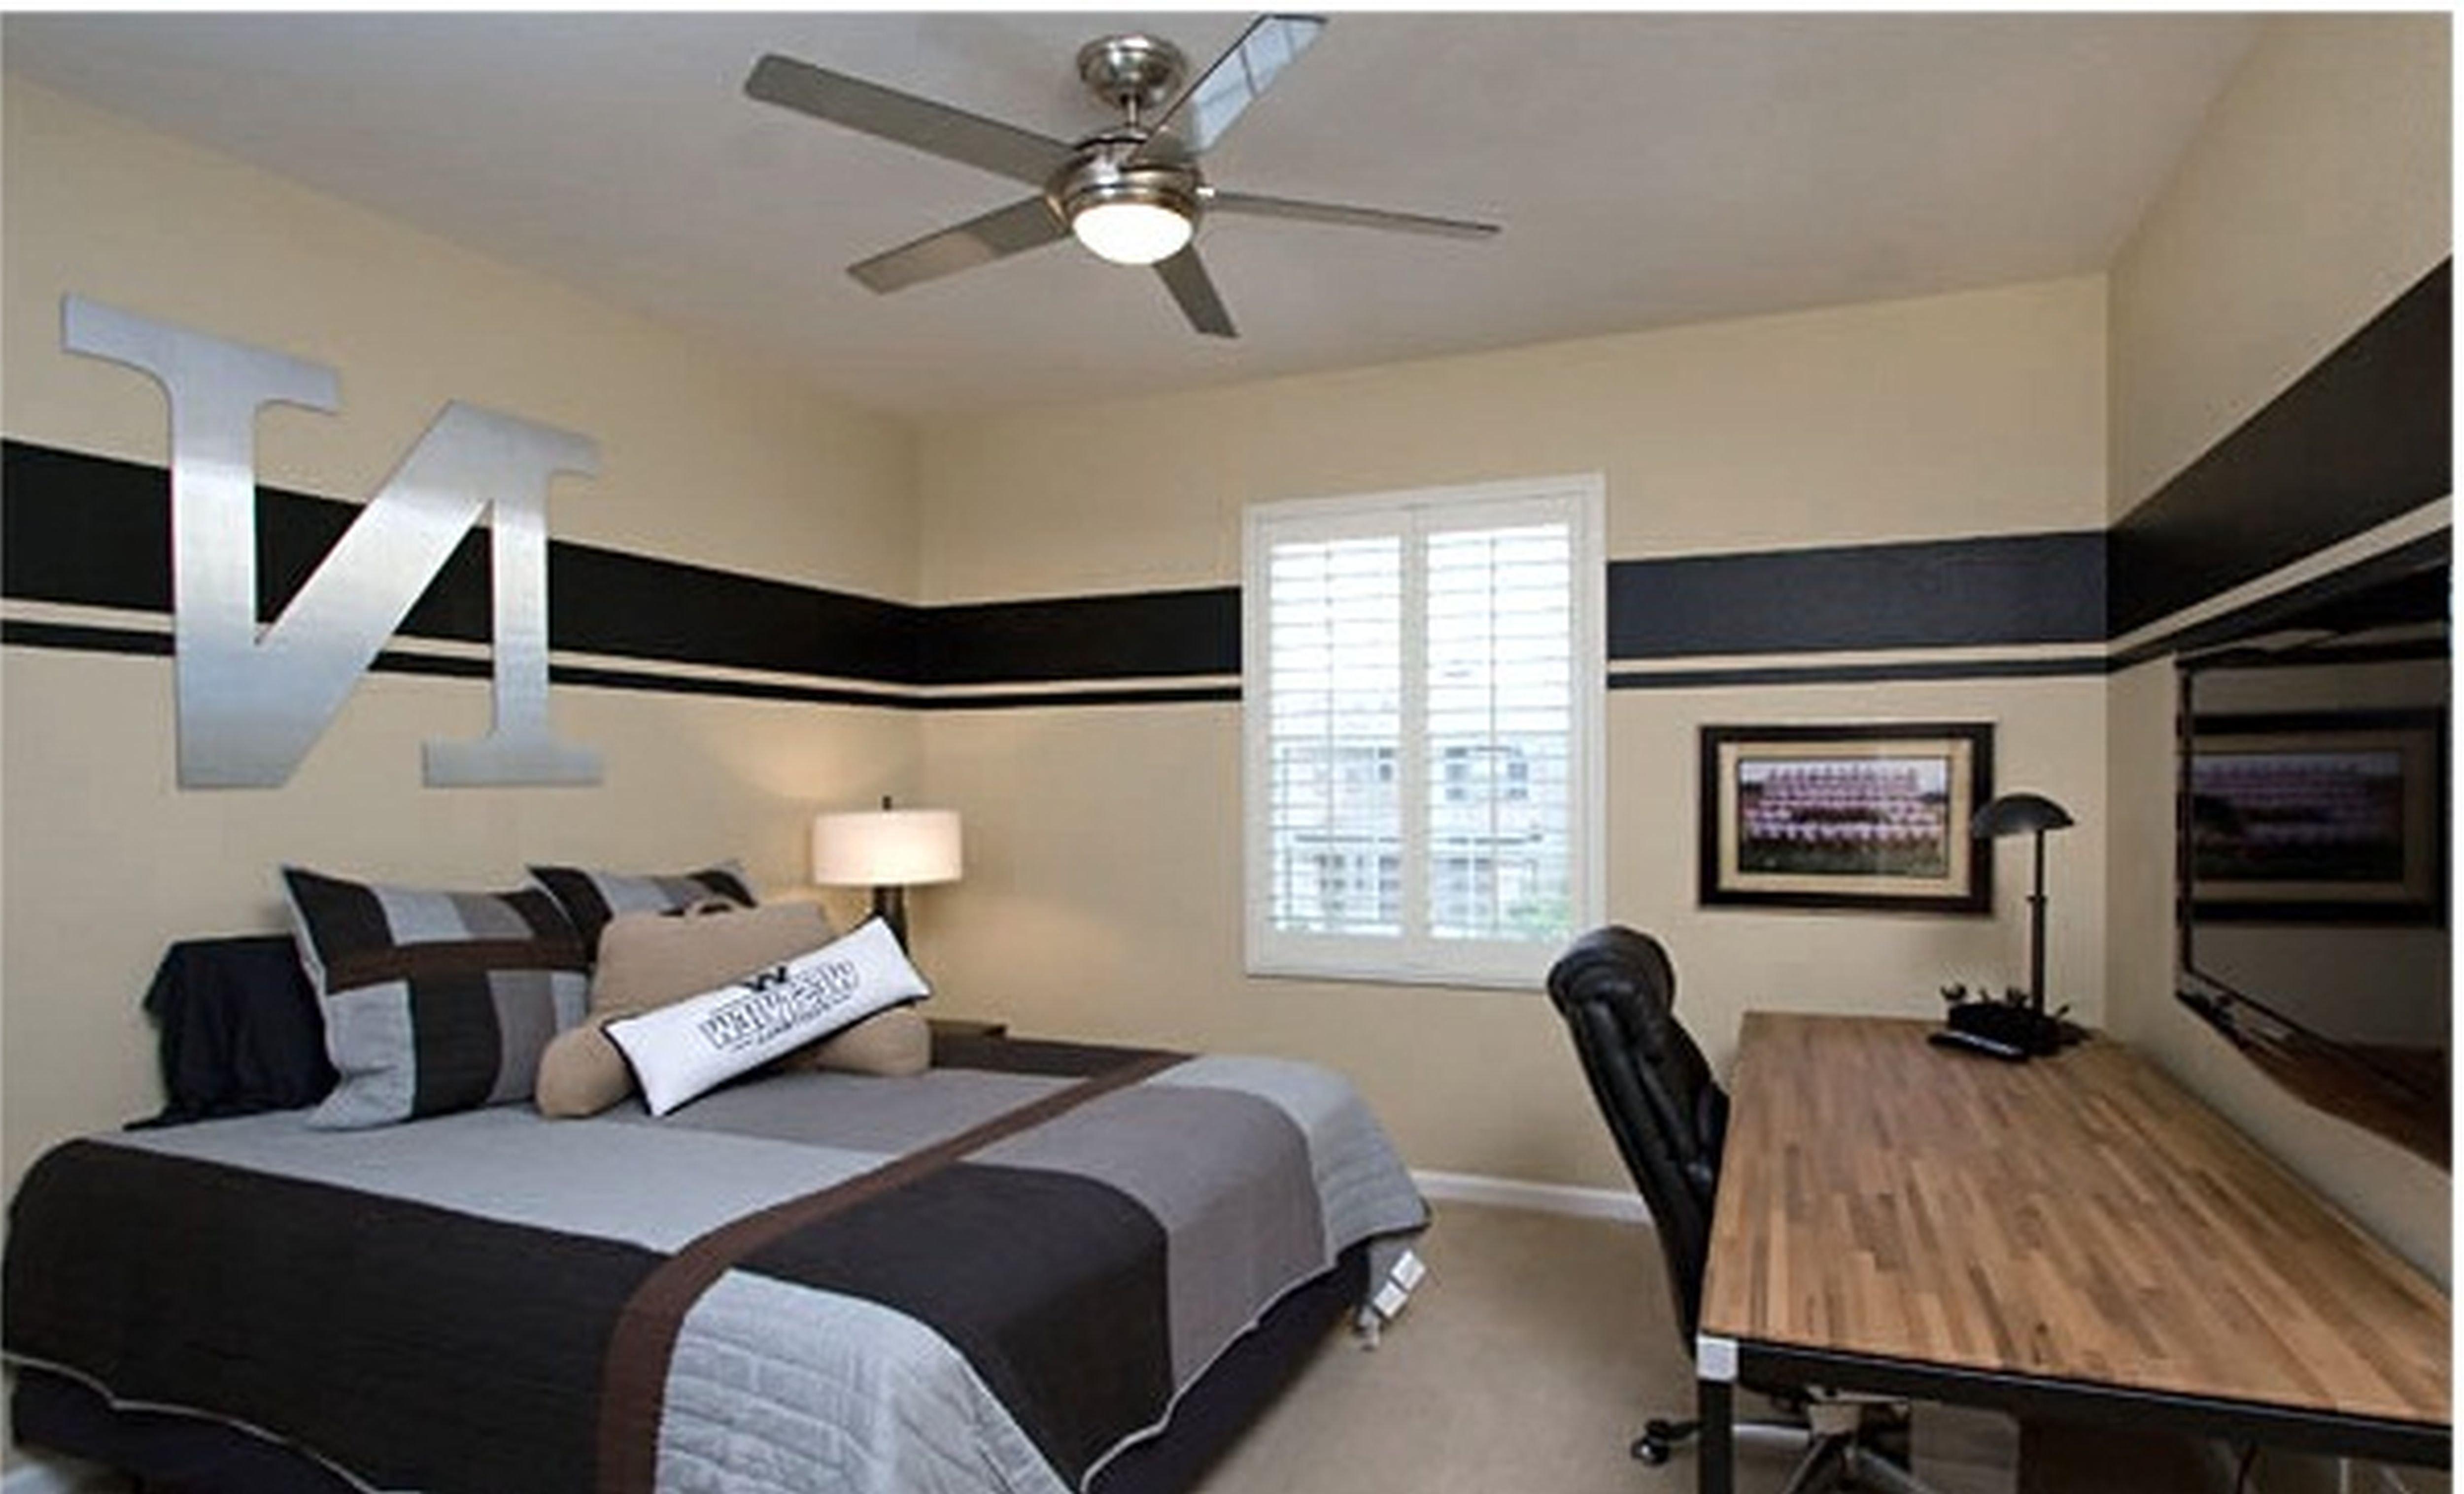 10 Great Room Design Ideas For Guys guys bedroom decor best of room decor ideas for guys room design 2020